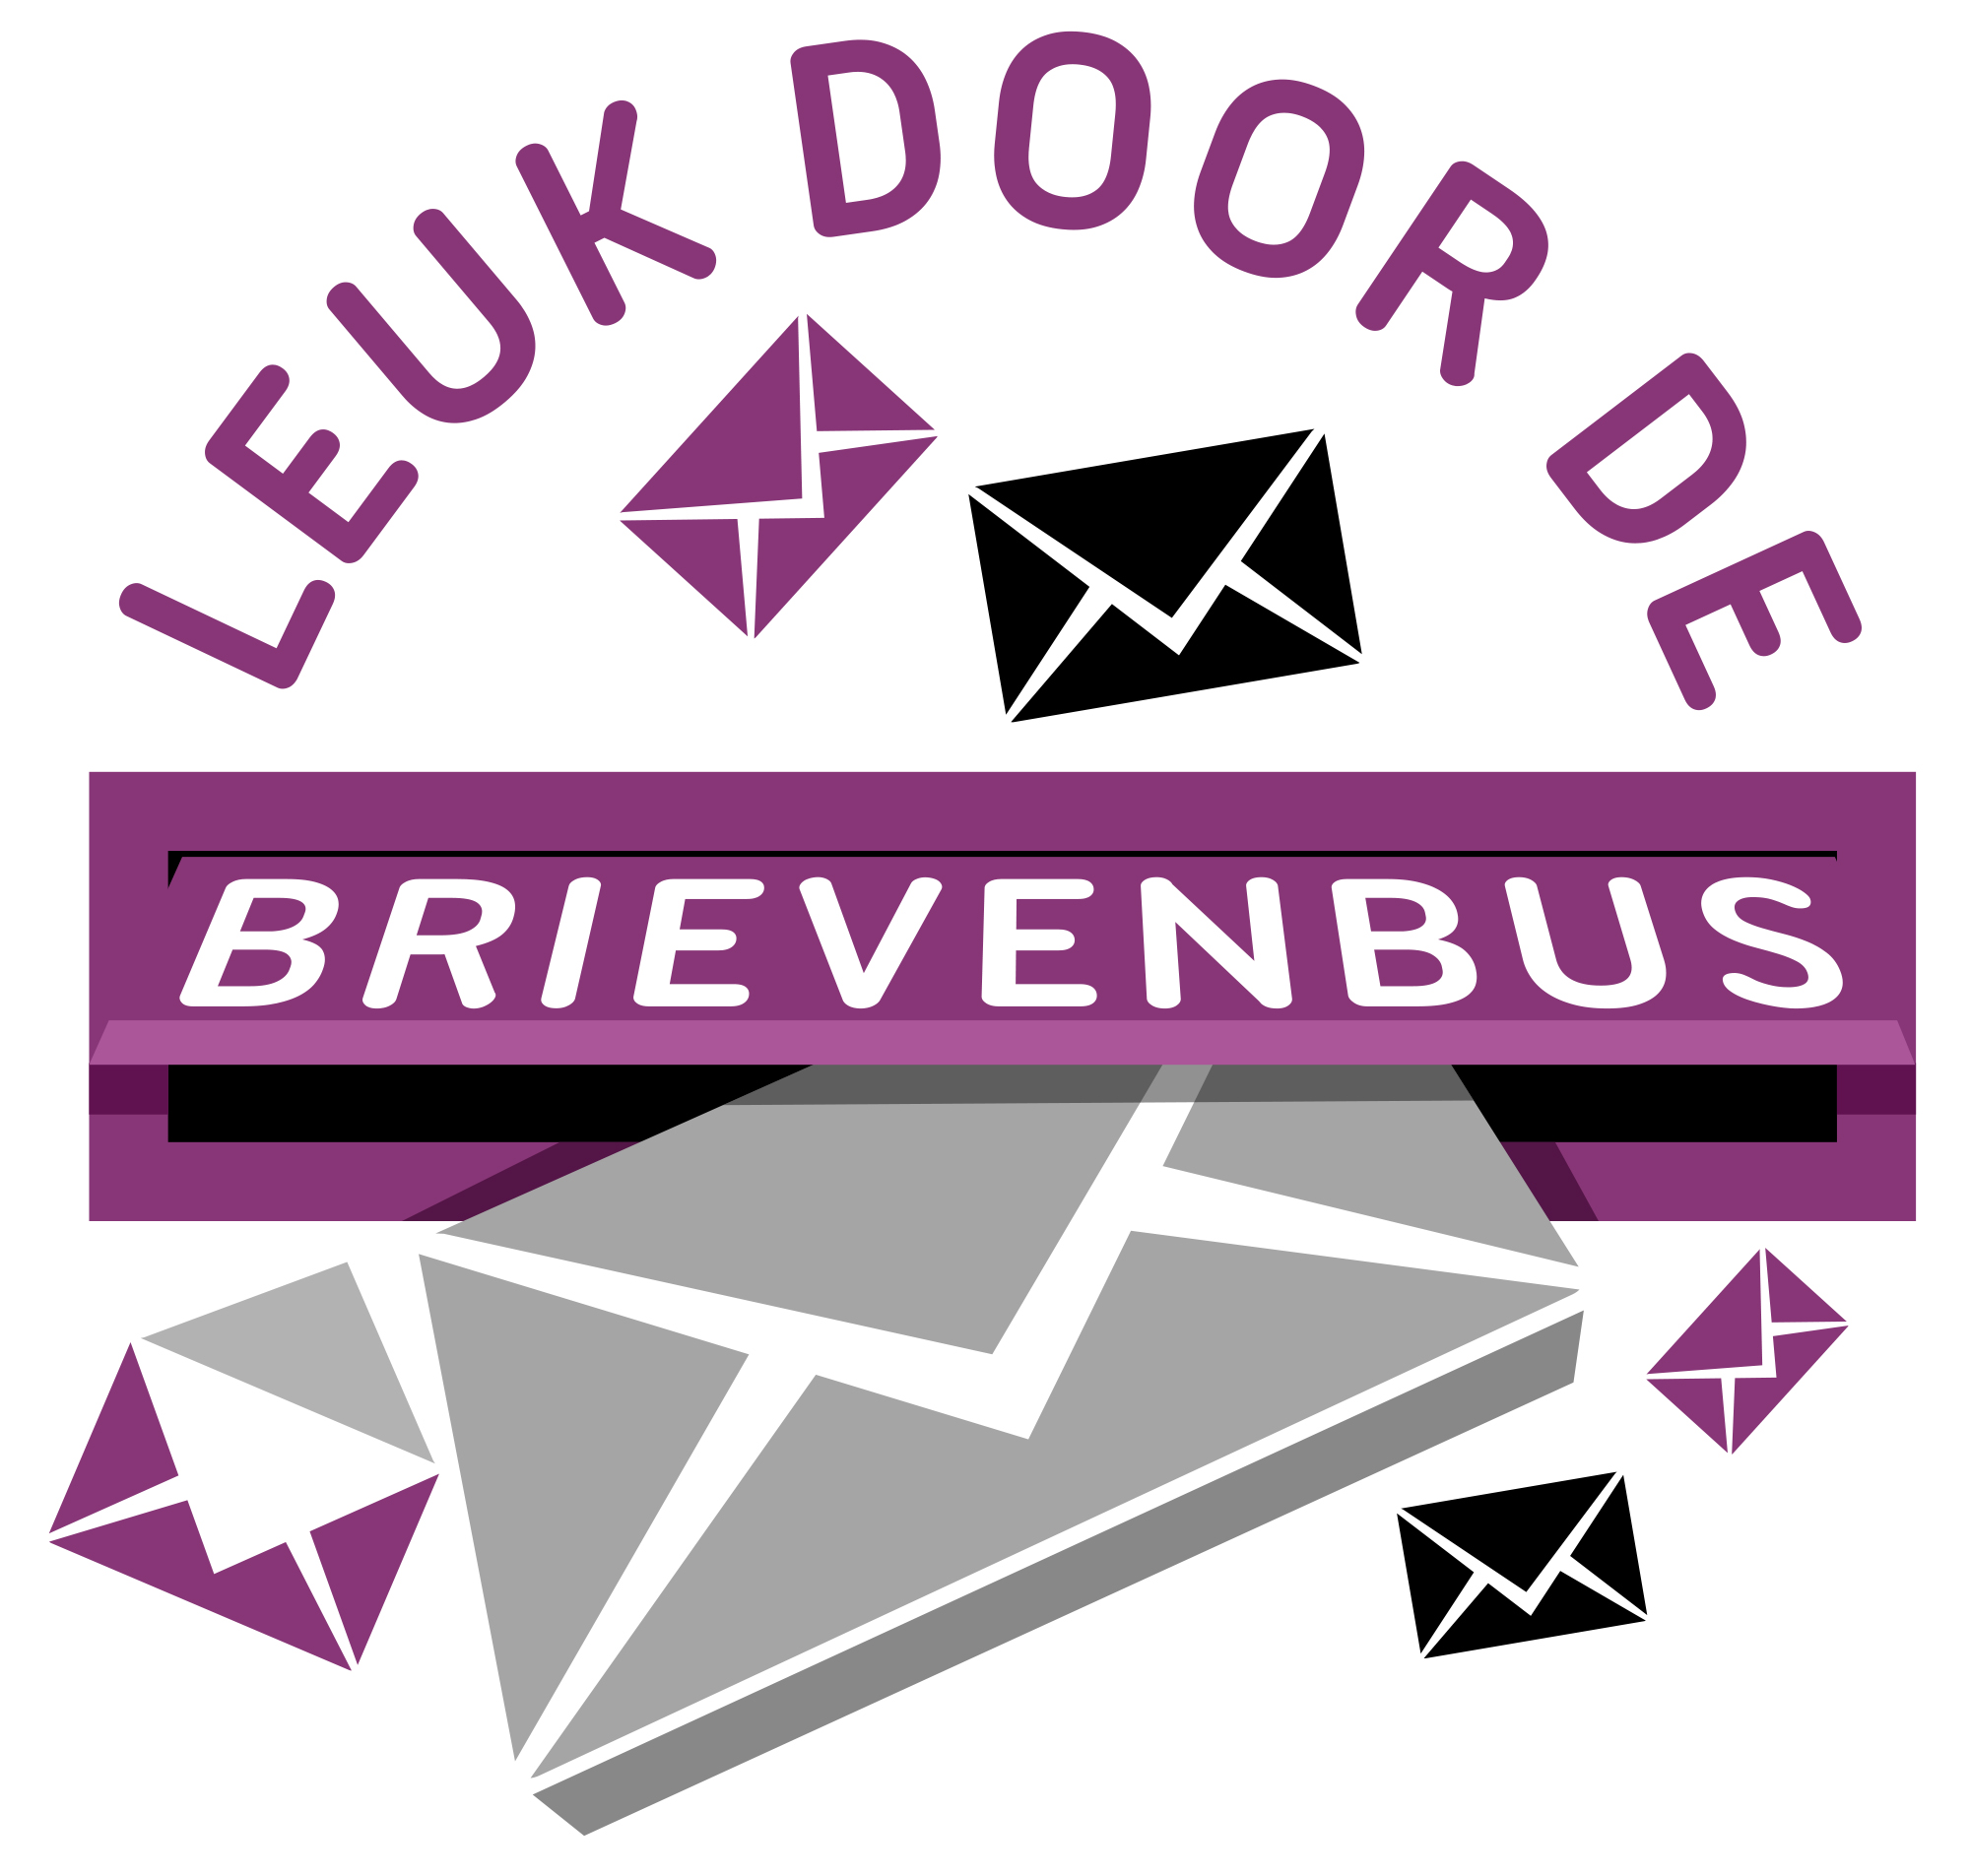 Logo Leukdoordebrievenbus.nl